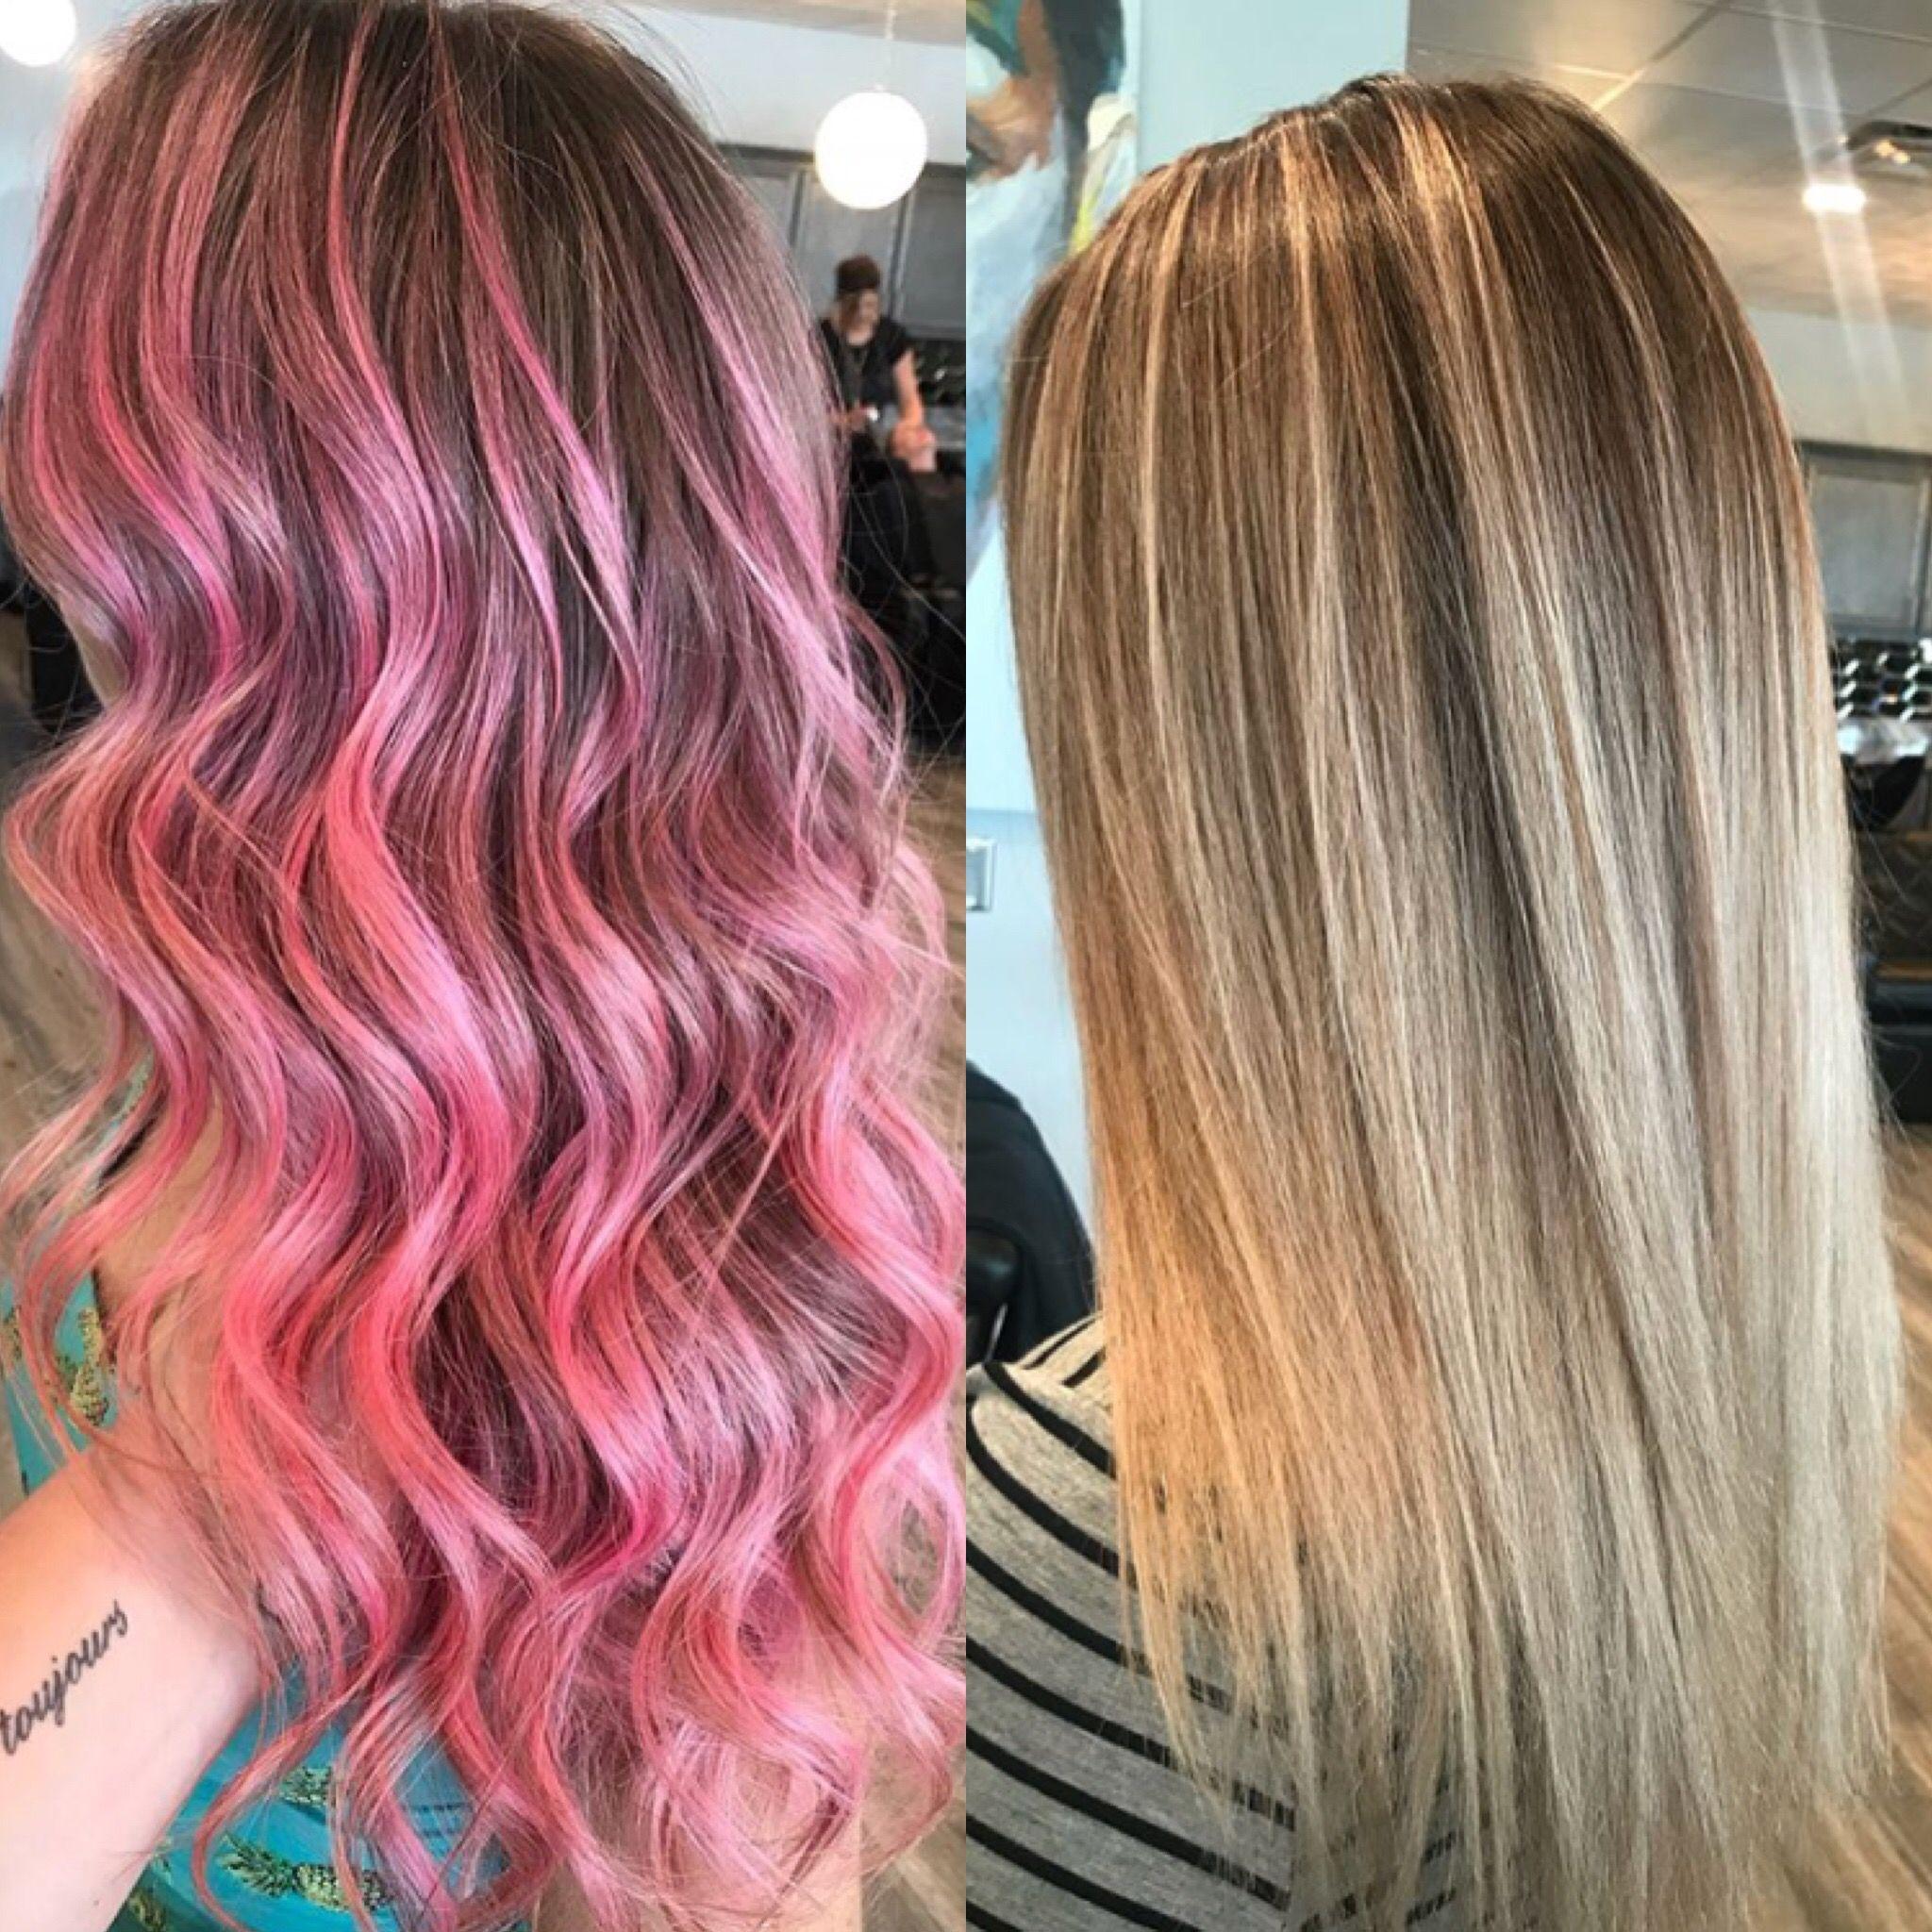 Hair Transformation Wow Pink Hair To Blonde Hair Artist Arielle Transformation Wow Makeove Hair Transformation Beliage Hair Blonde Hair Transformations